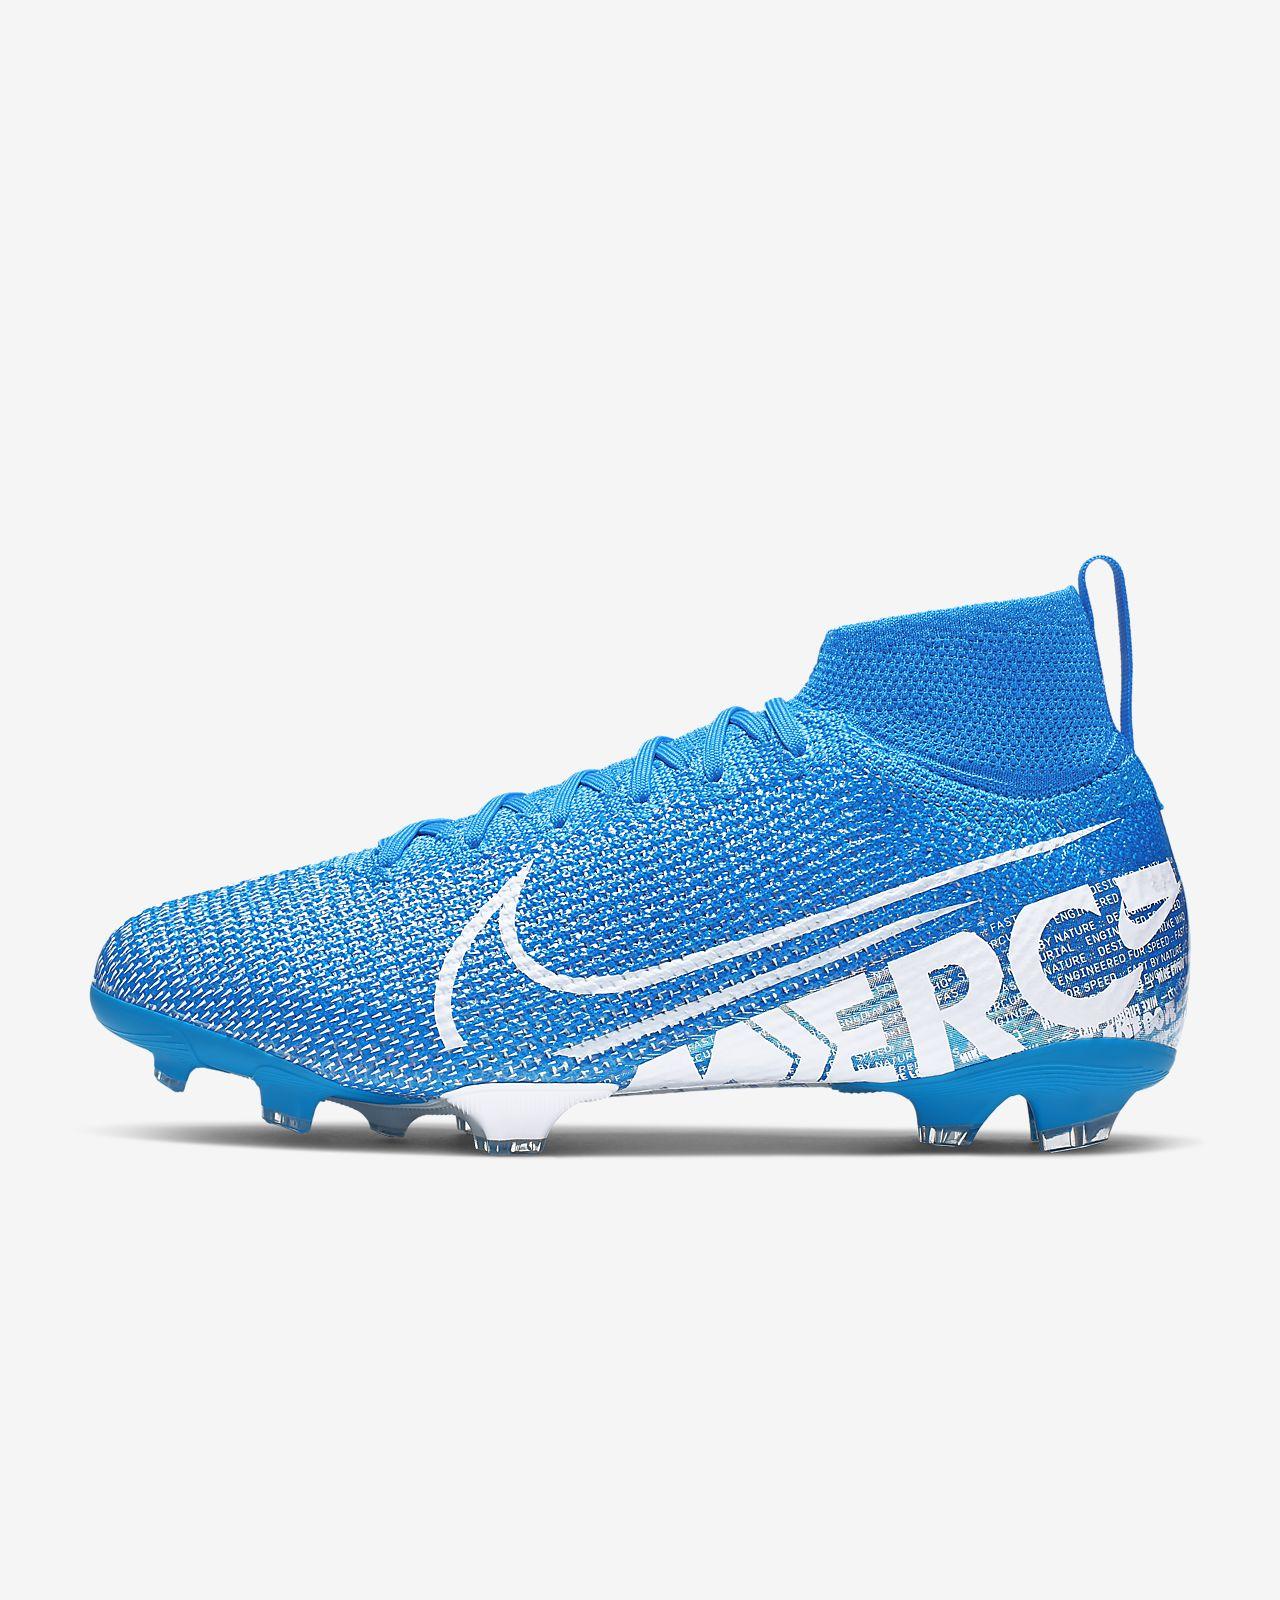 Calcio Da Mercurial Acquista Cr7 Scarpe Superfly Nike Scarpa